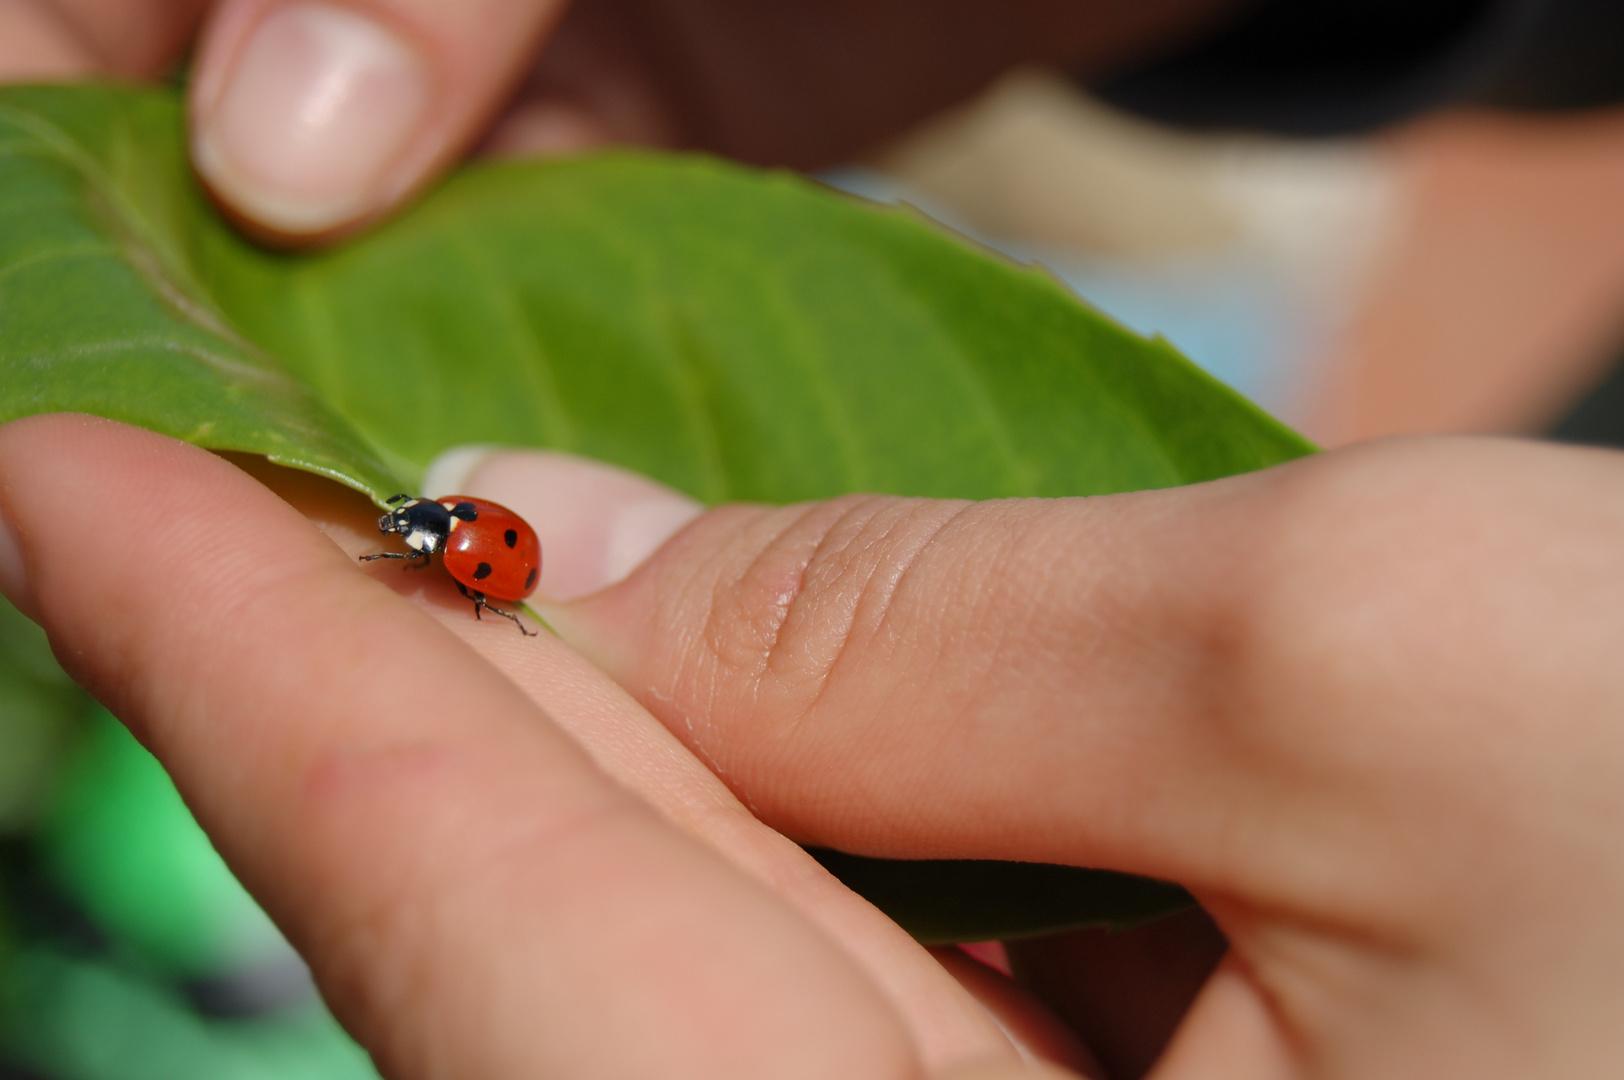 Ladybird and hand